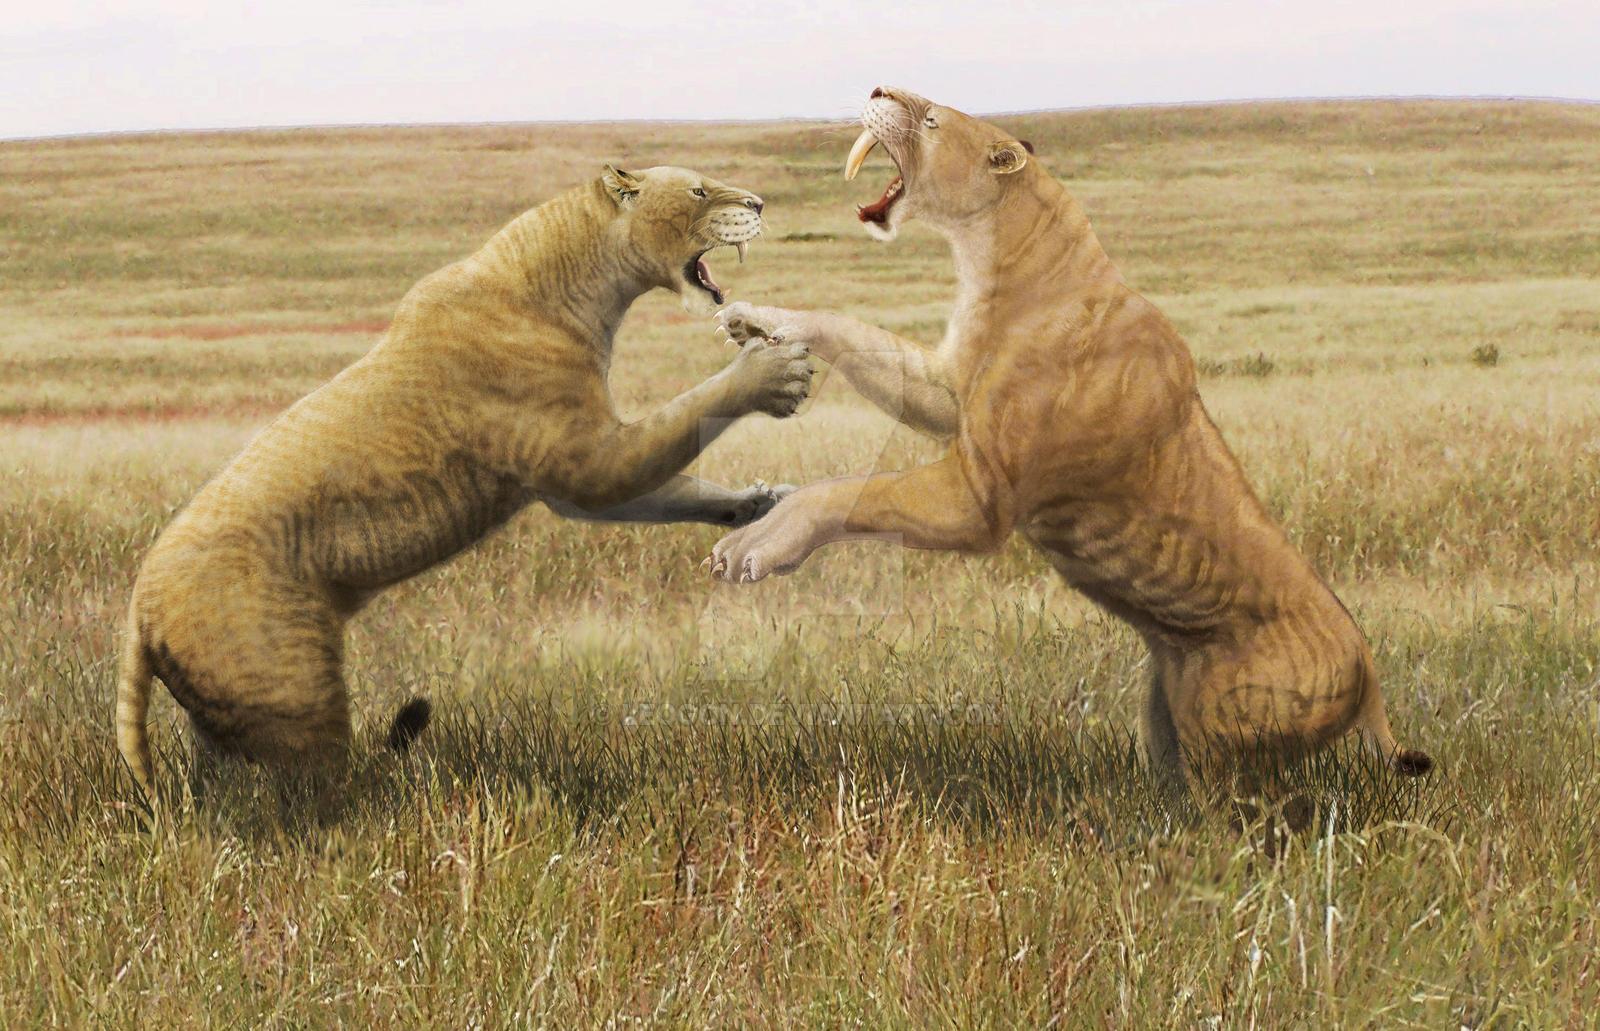 American lion vs Smilodon populator by Leogon on DeviantArt